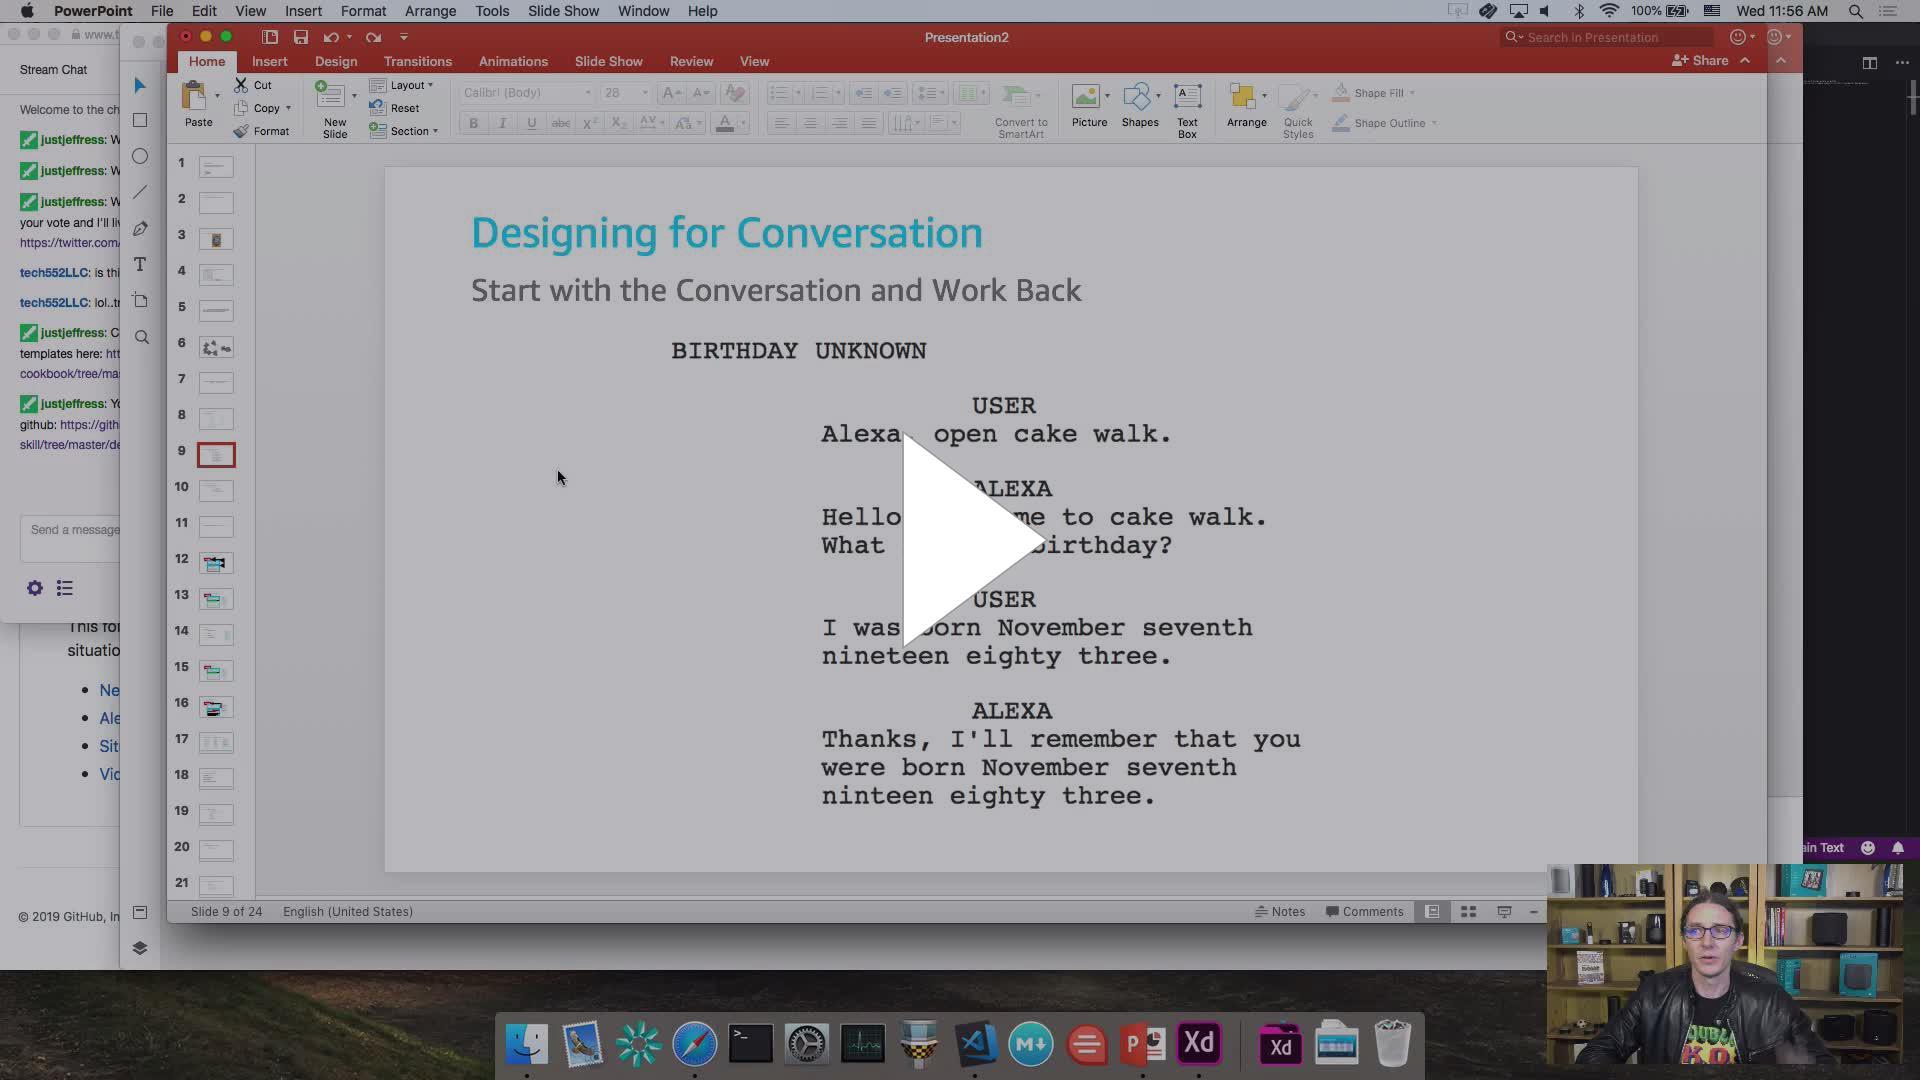 amazonalexa - Highlight: How to Build an Engaging Alexa